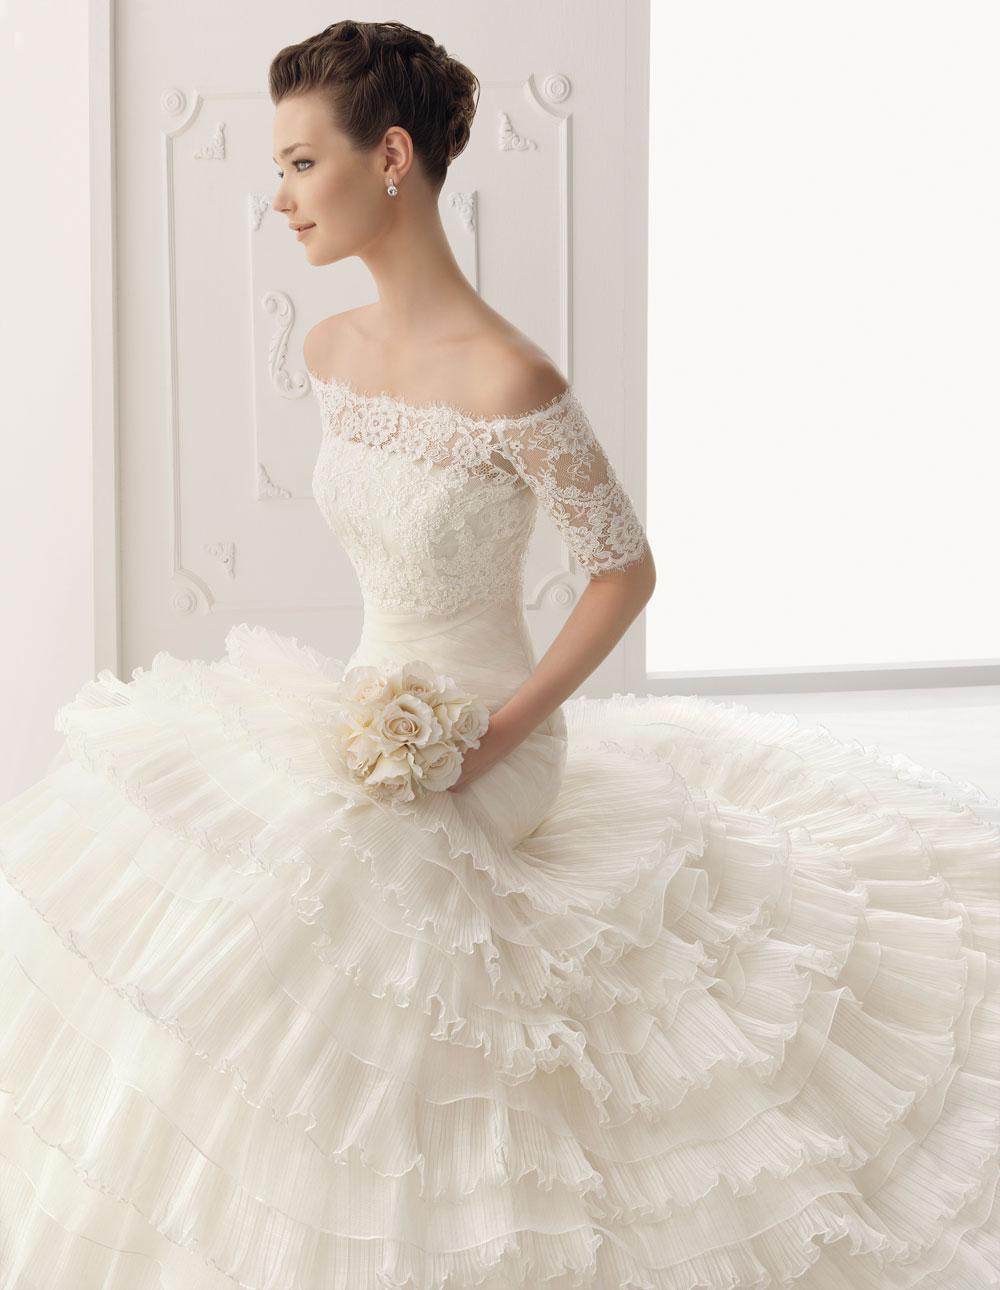 Iloilo Wedding Blog: {Wedding Gown Inspiration} Alma Novia Wedding ...